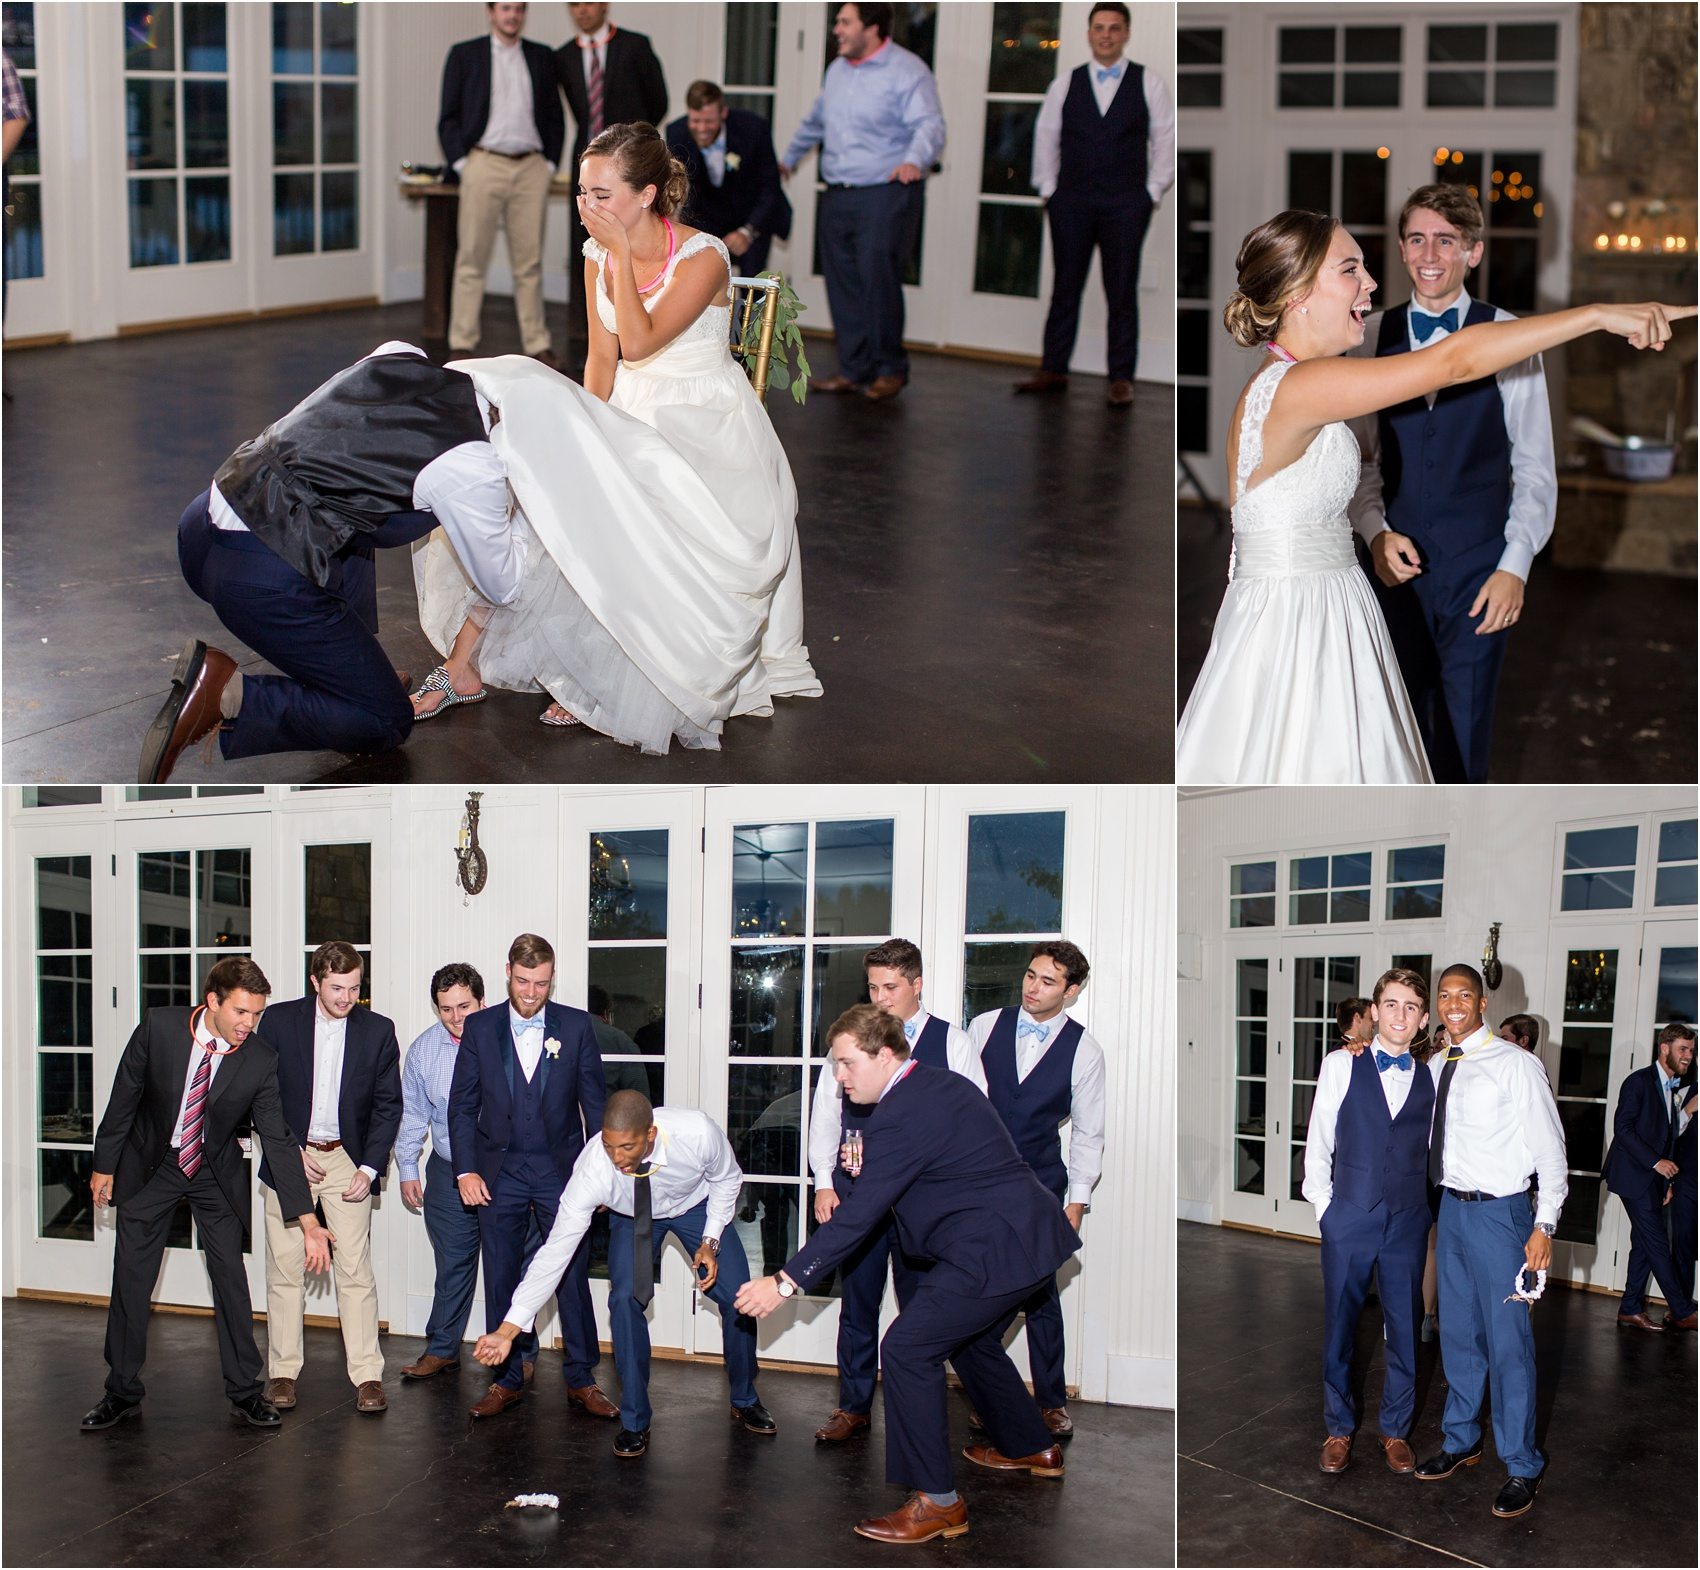 Savannah Eve Photography- Sigl-Adams Wedding- Sneak Peek-93.jpg